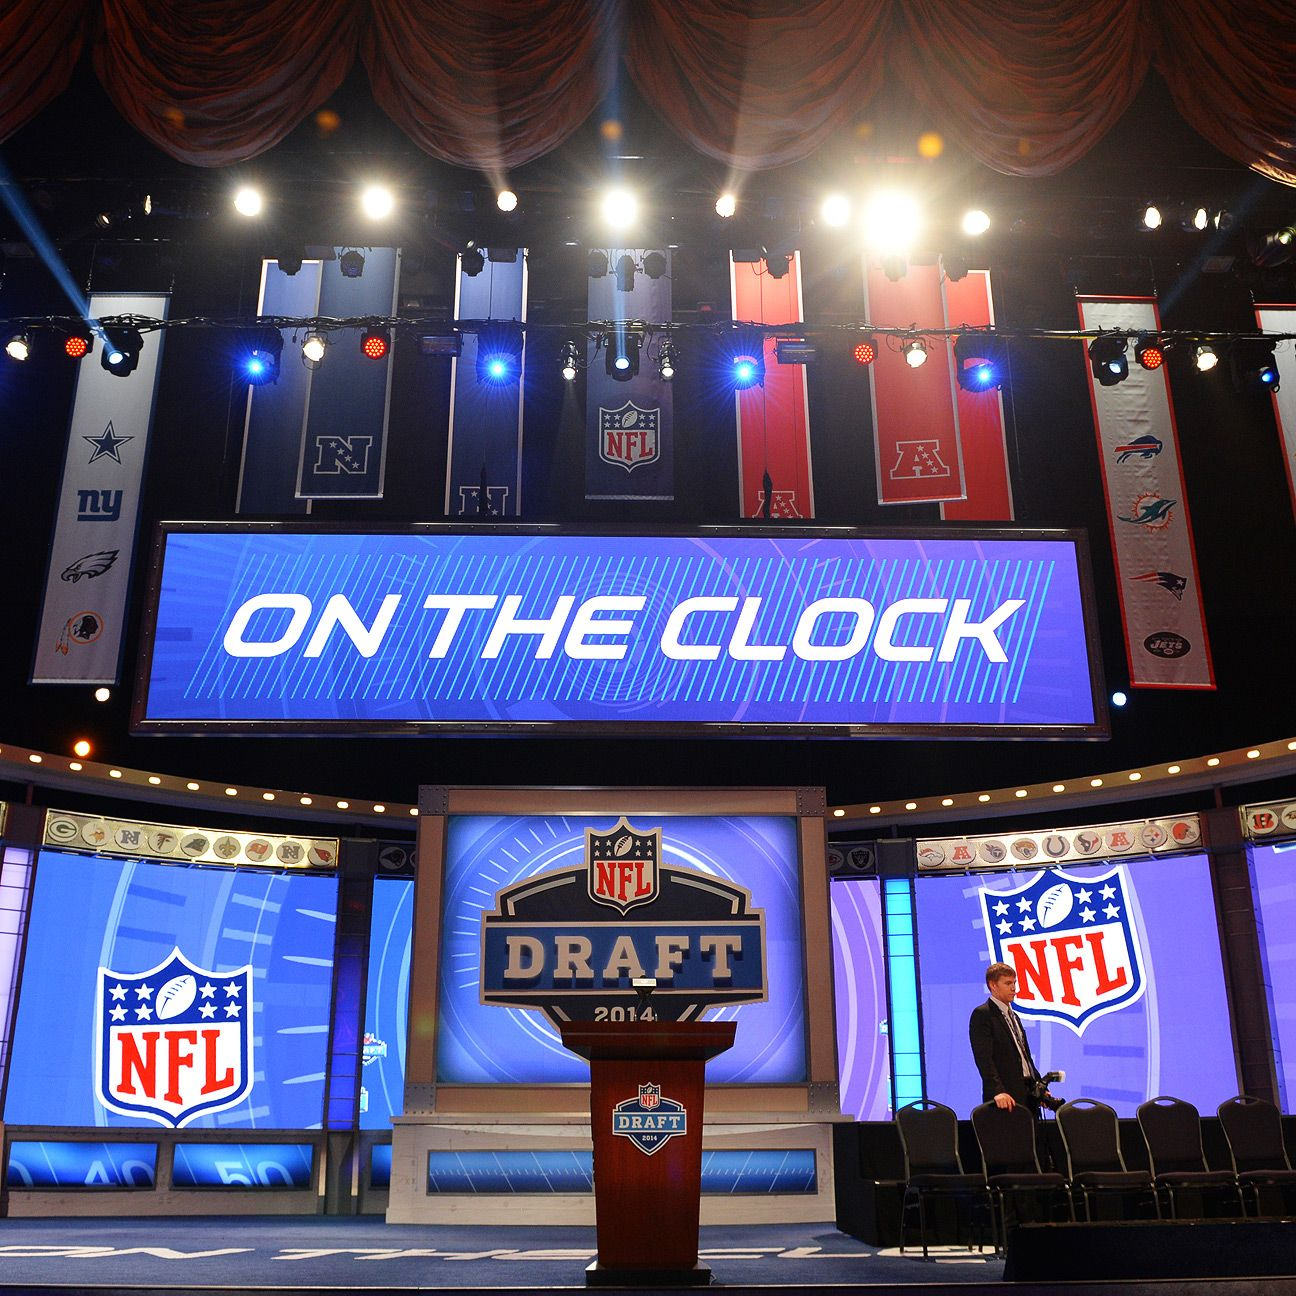 Colts Procedura wycofania bet at home bet at home kod rabatowy Desktop Wallpaper 2015